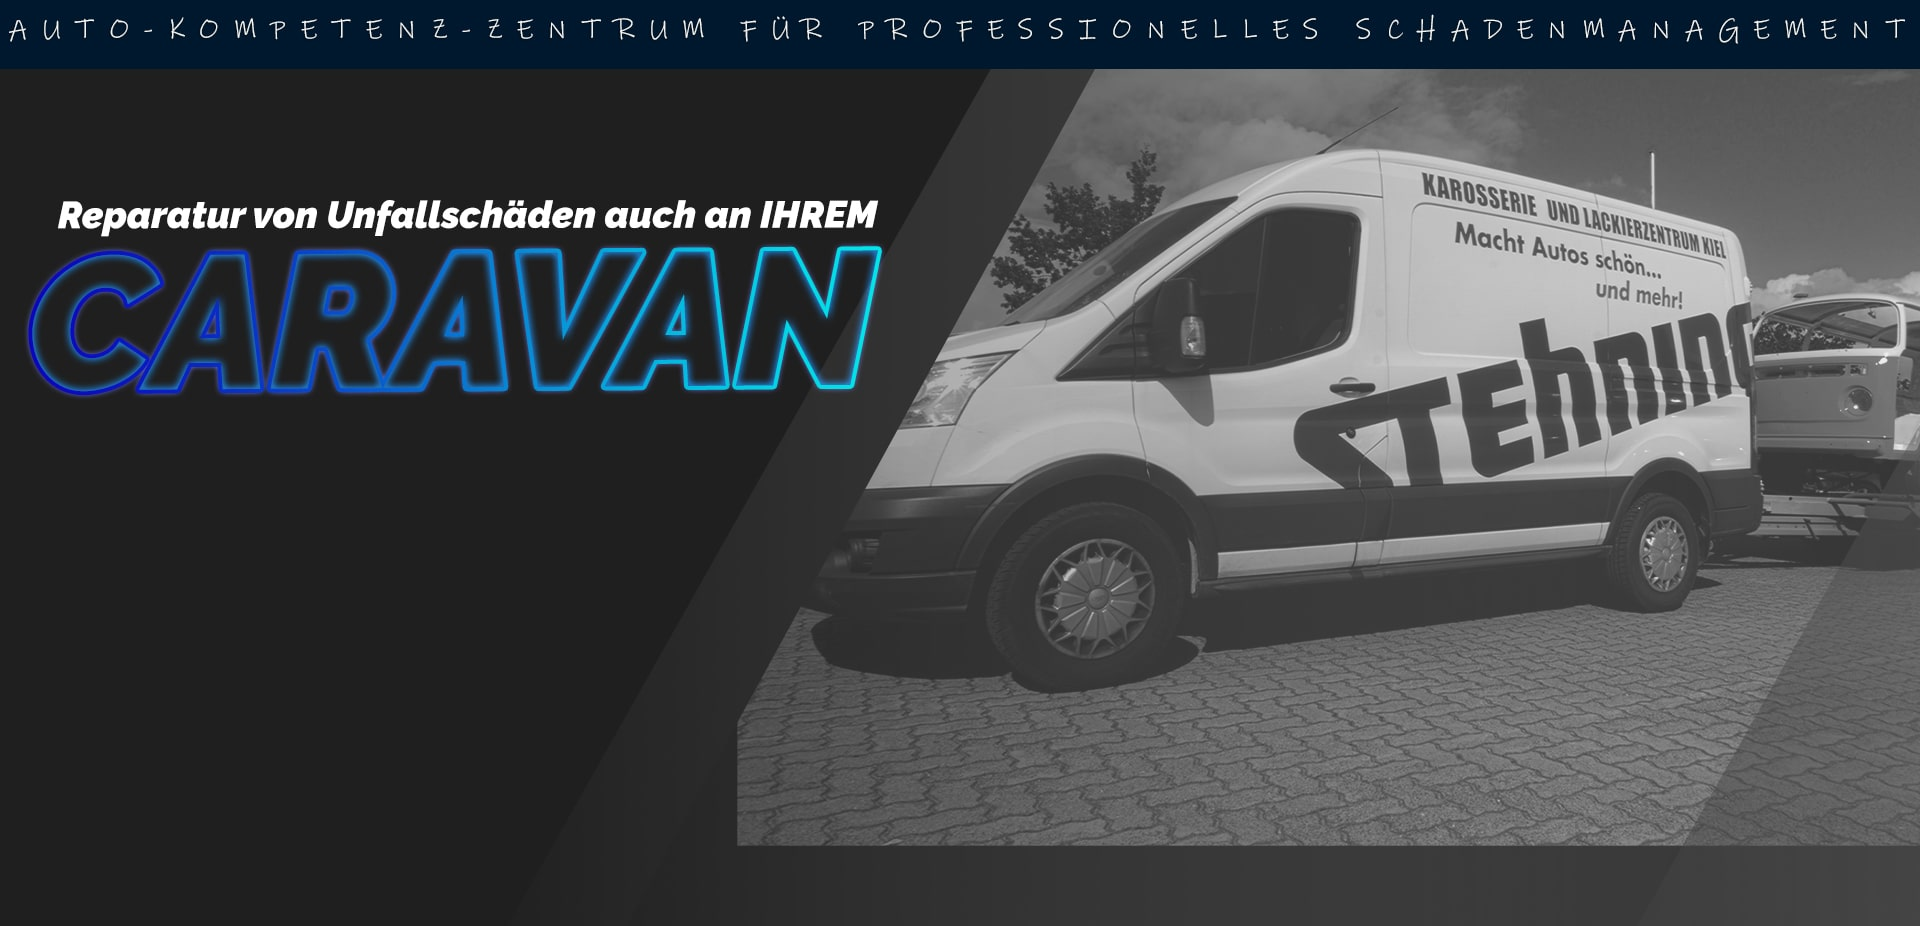 2222Header_2_Edit_Caravan-min-min